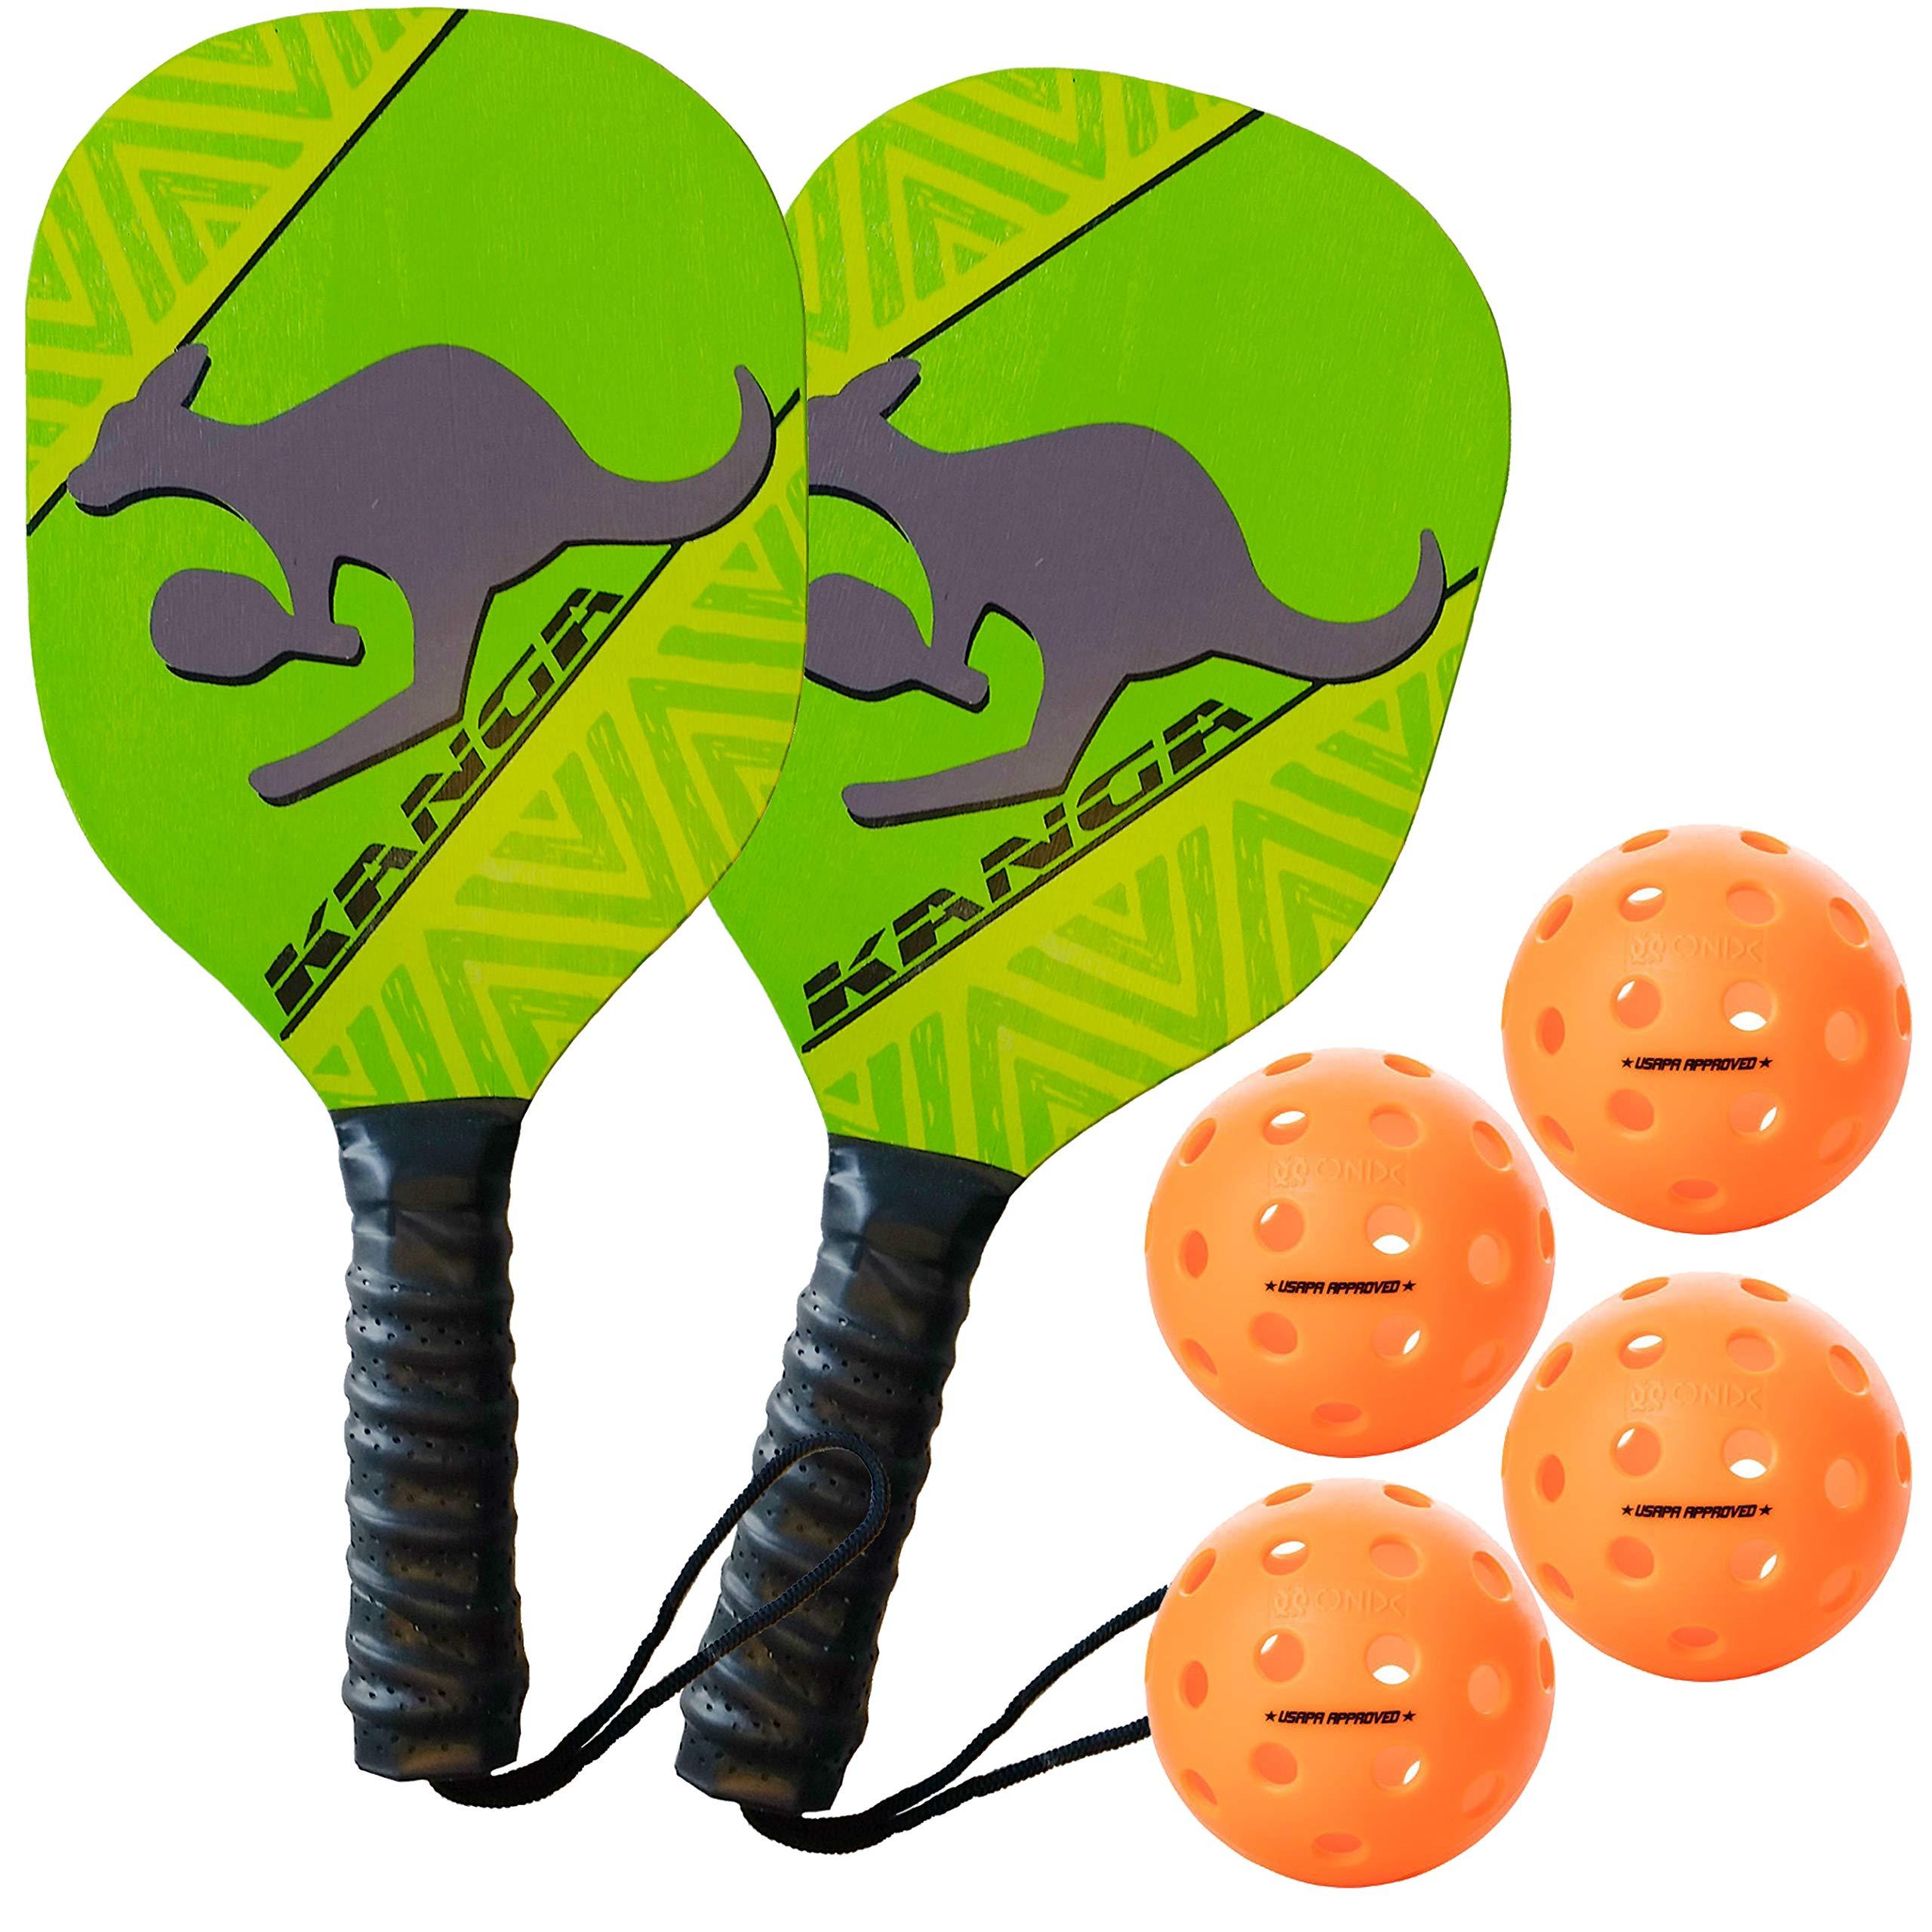 Kanga Beginner Pickleball Paddle & Bundles (3 Options: Single Paddle, 2 Paddle/4 Ball Bundle, 4 Paddle/6 Ball Bundle) (4 Paddle/4 Ball Pack - Orange Balls) by PickleballCentral